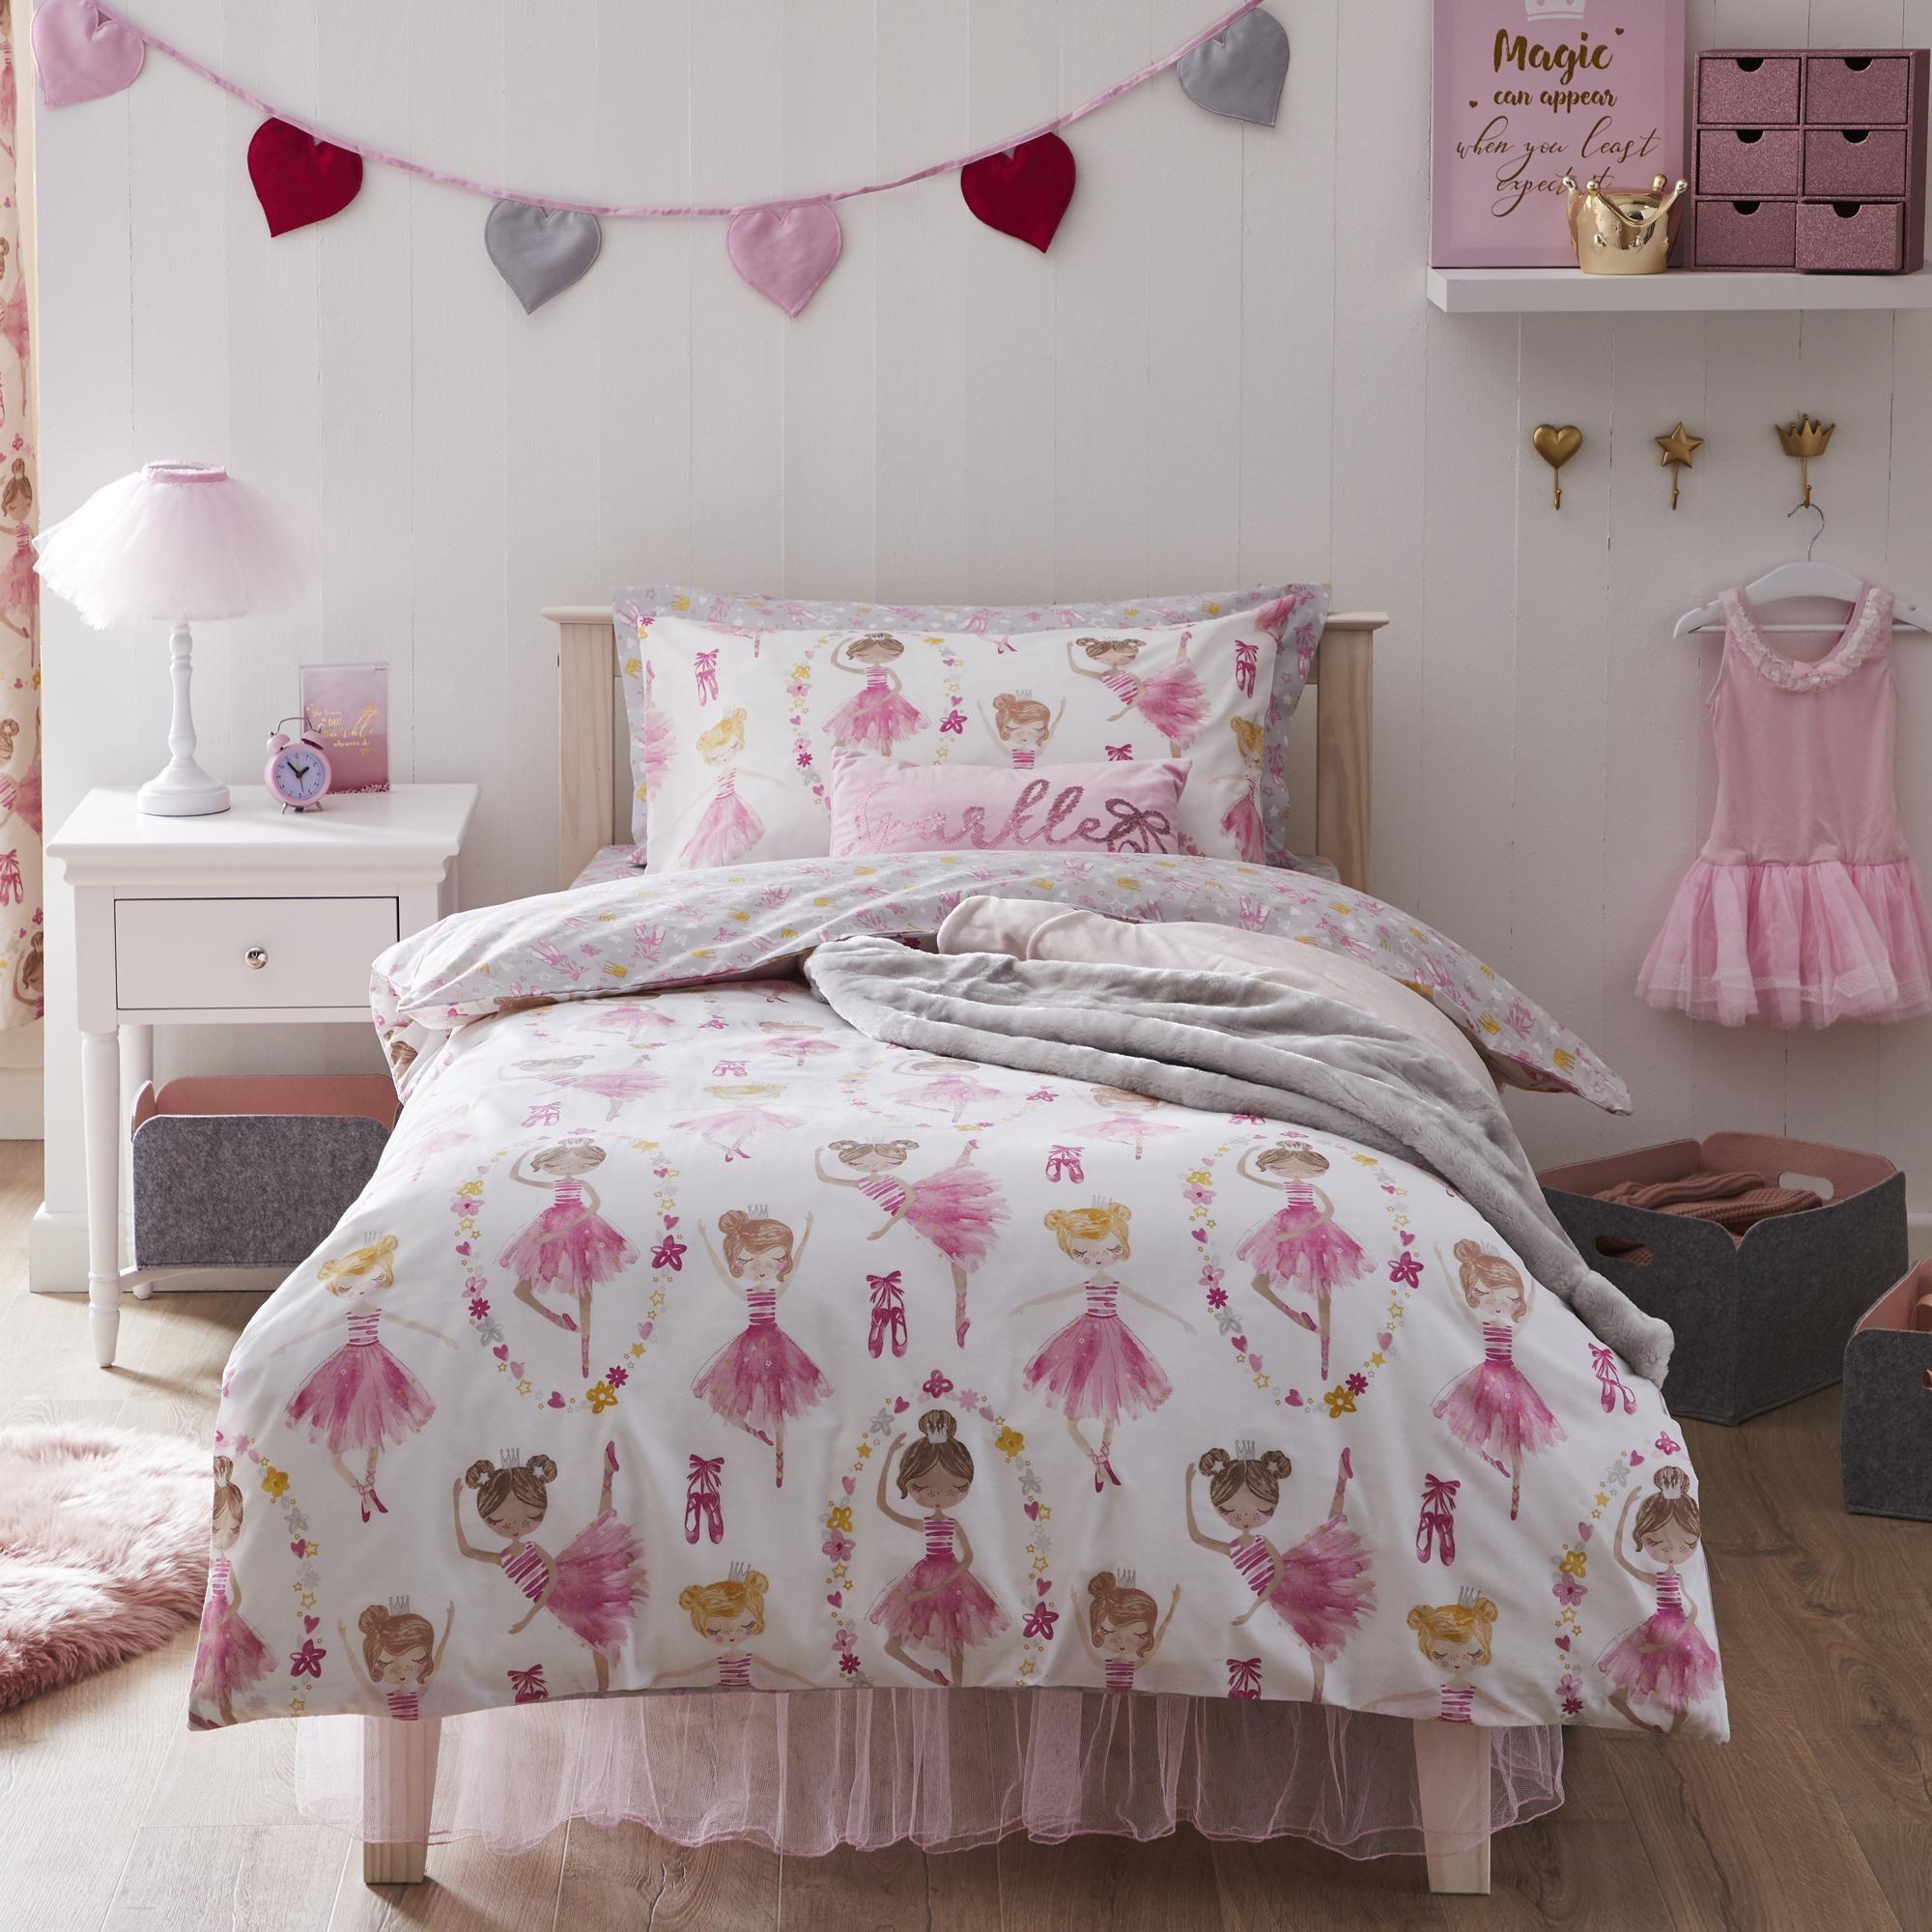 Ballet Duvet Cover and Pillowcase Set in 8  Kids bedding sets